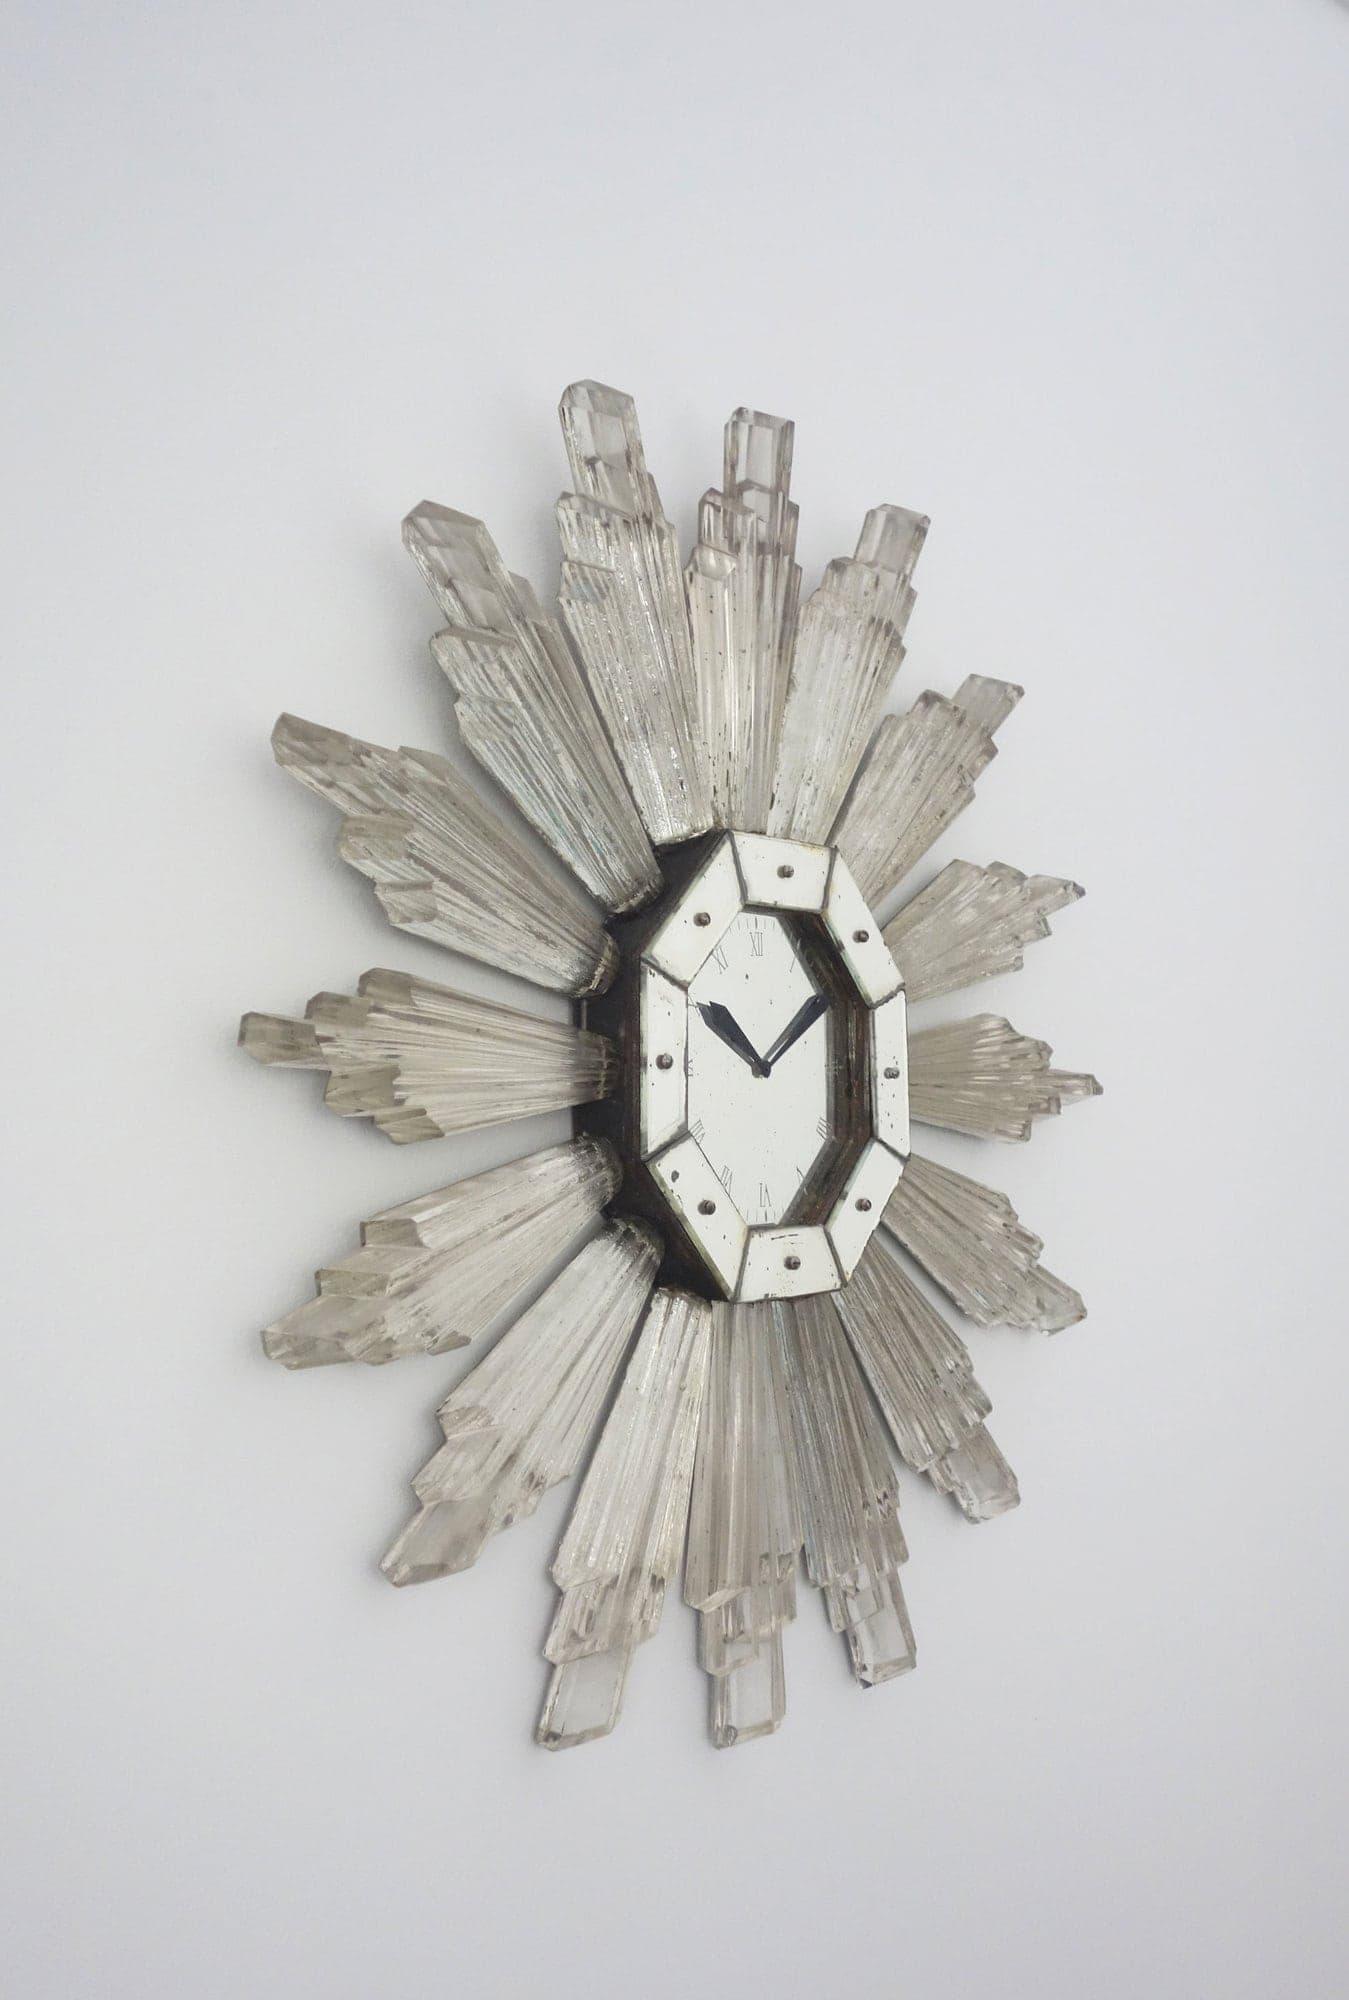 Serge Roche, Très rare horloge murale (vendue), vue 03